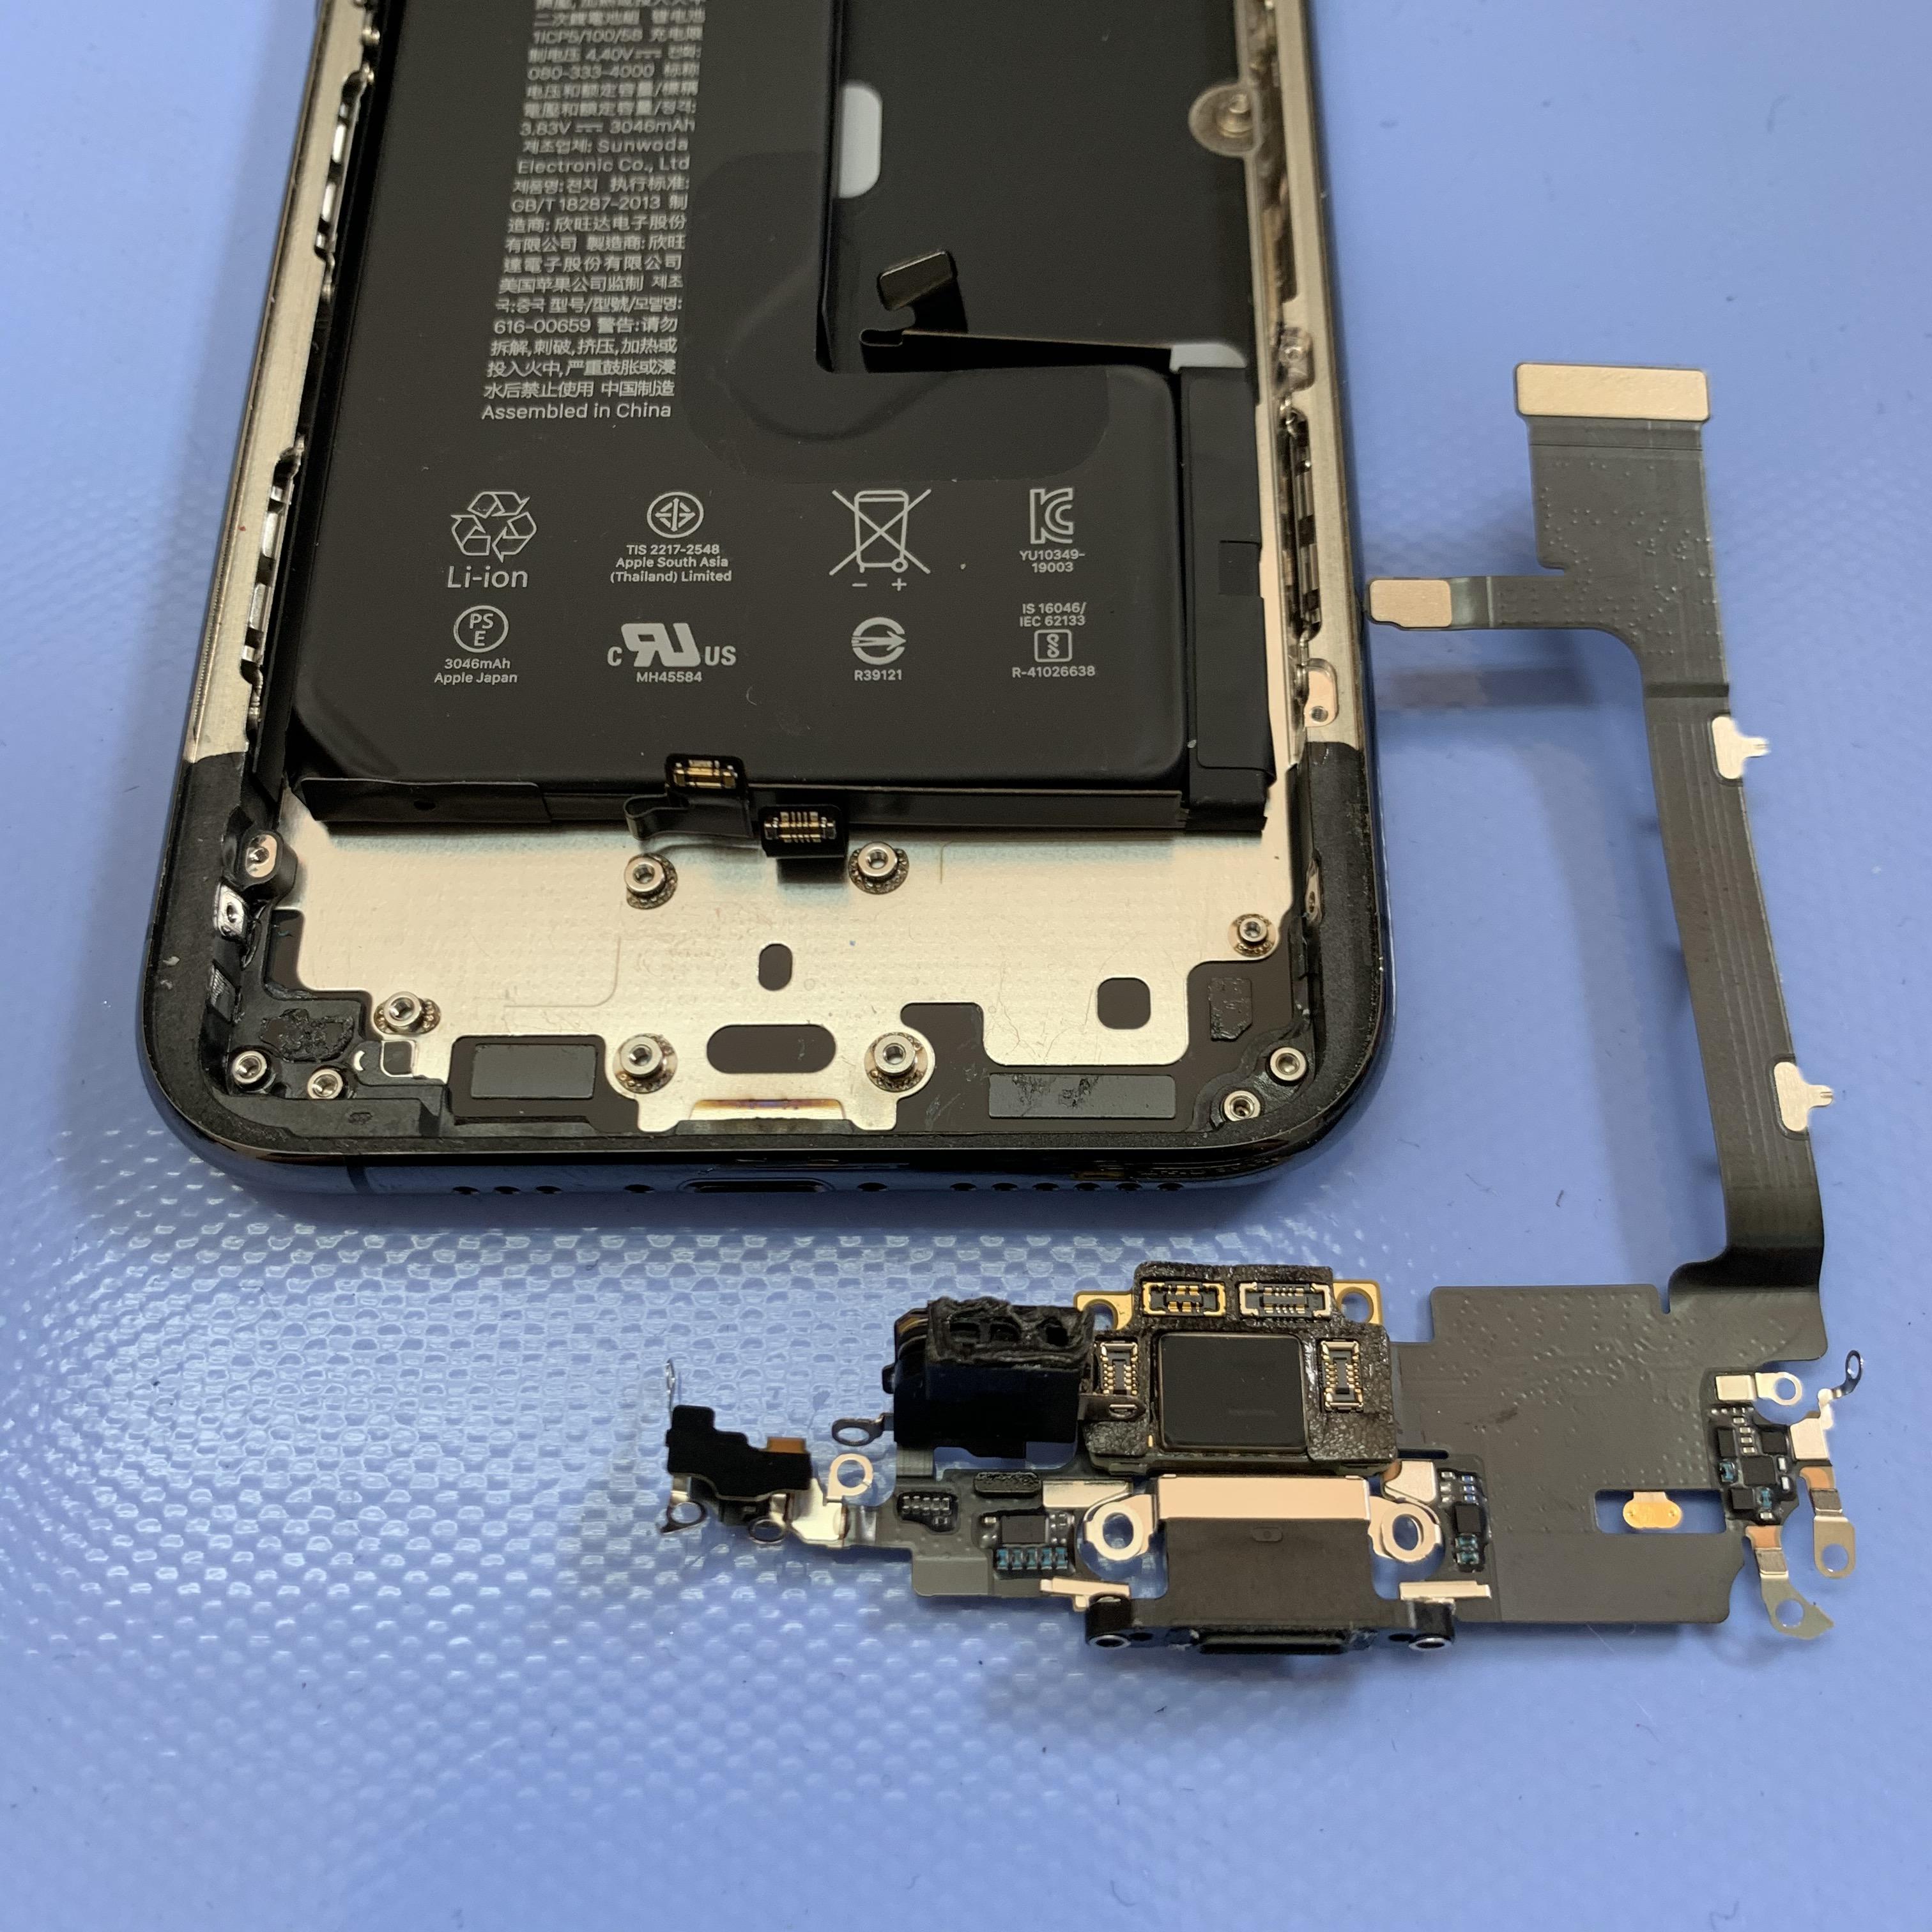 iPhone11Proのライトニングコネクタを外す